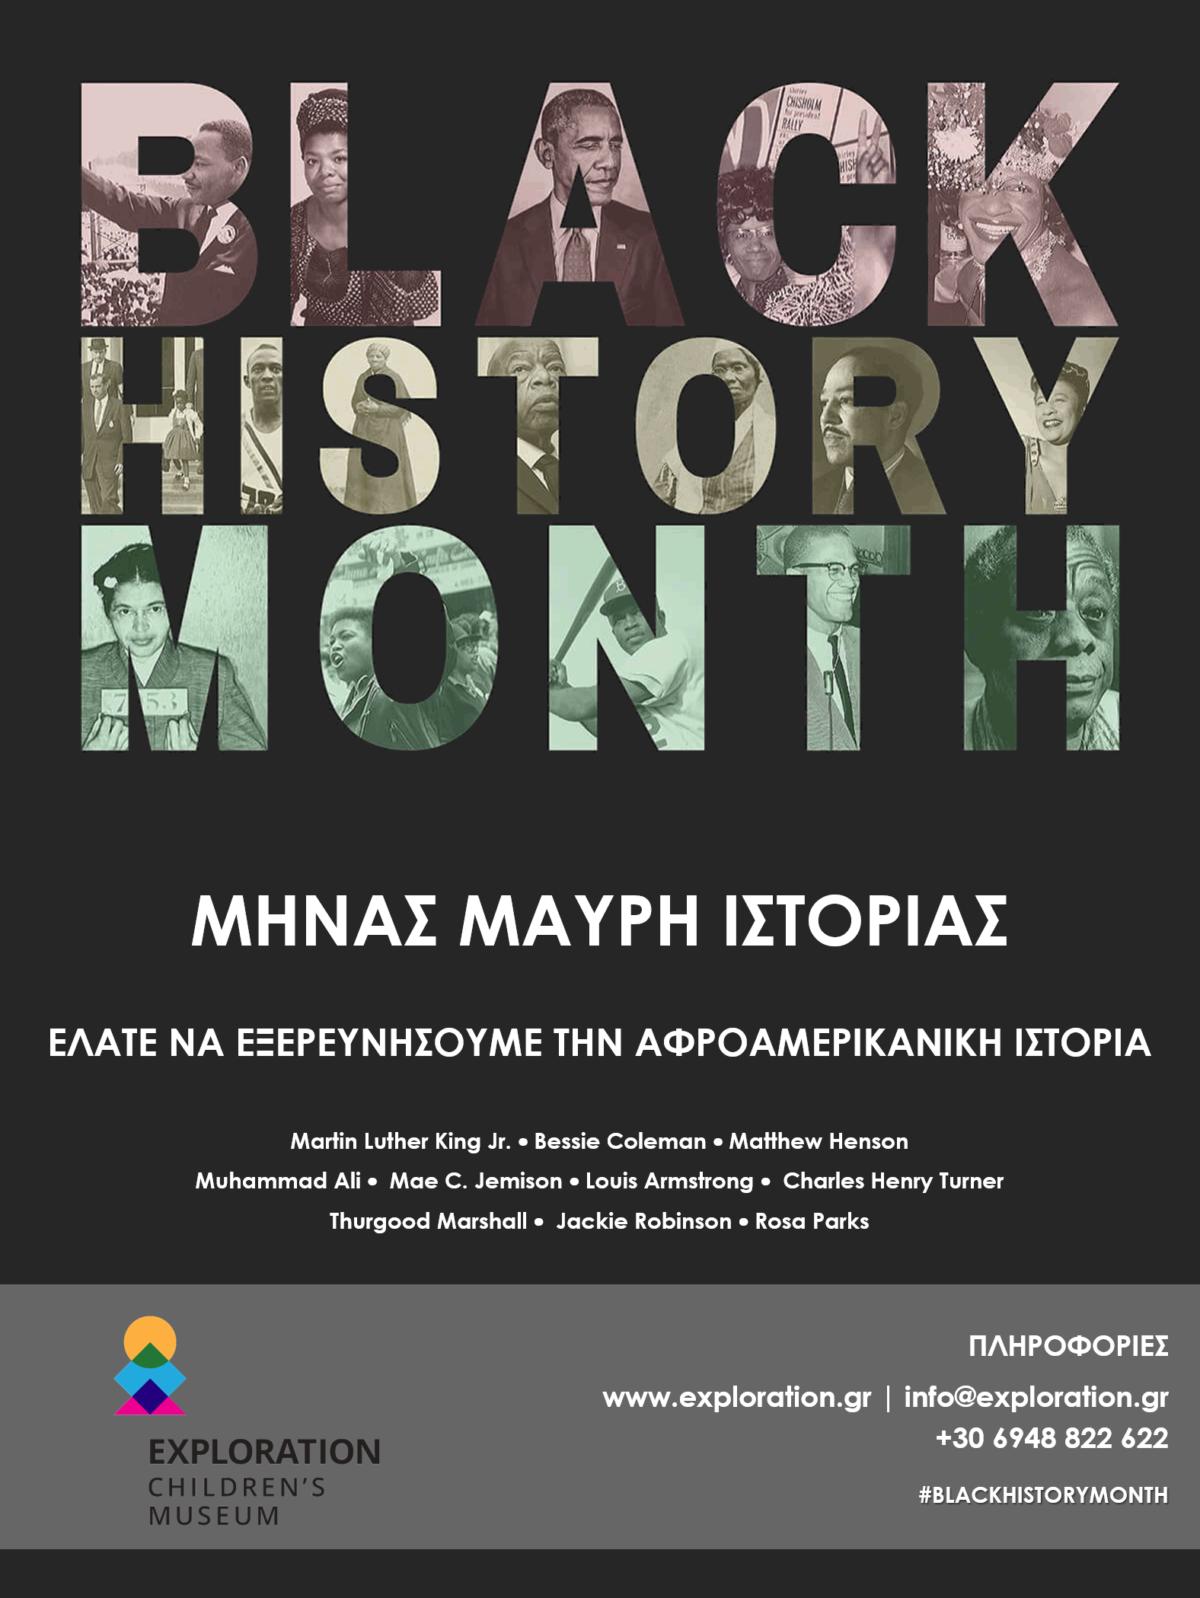 Black History Month στο Παιδικό Μουσείο Exploration!